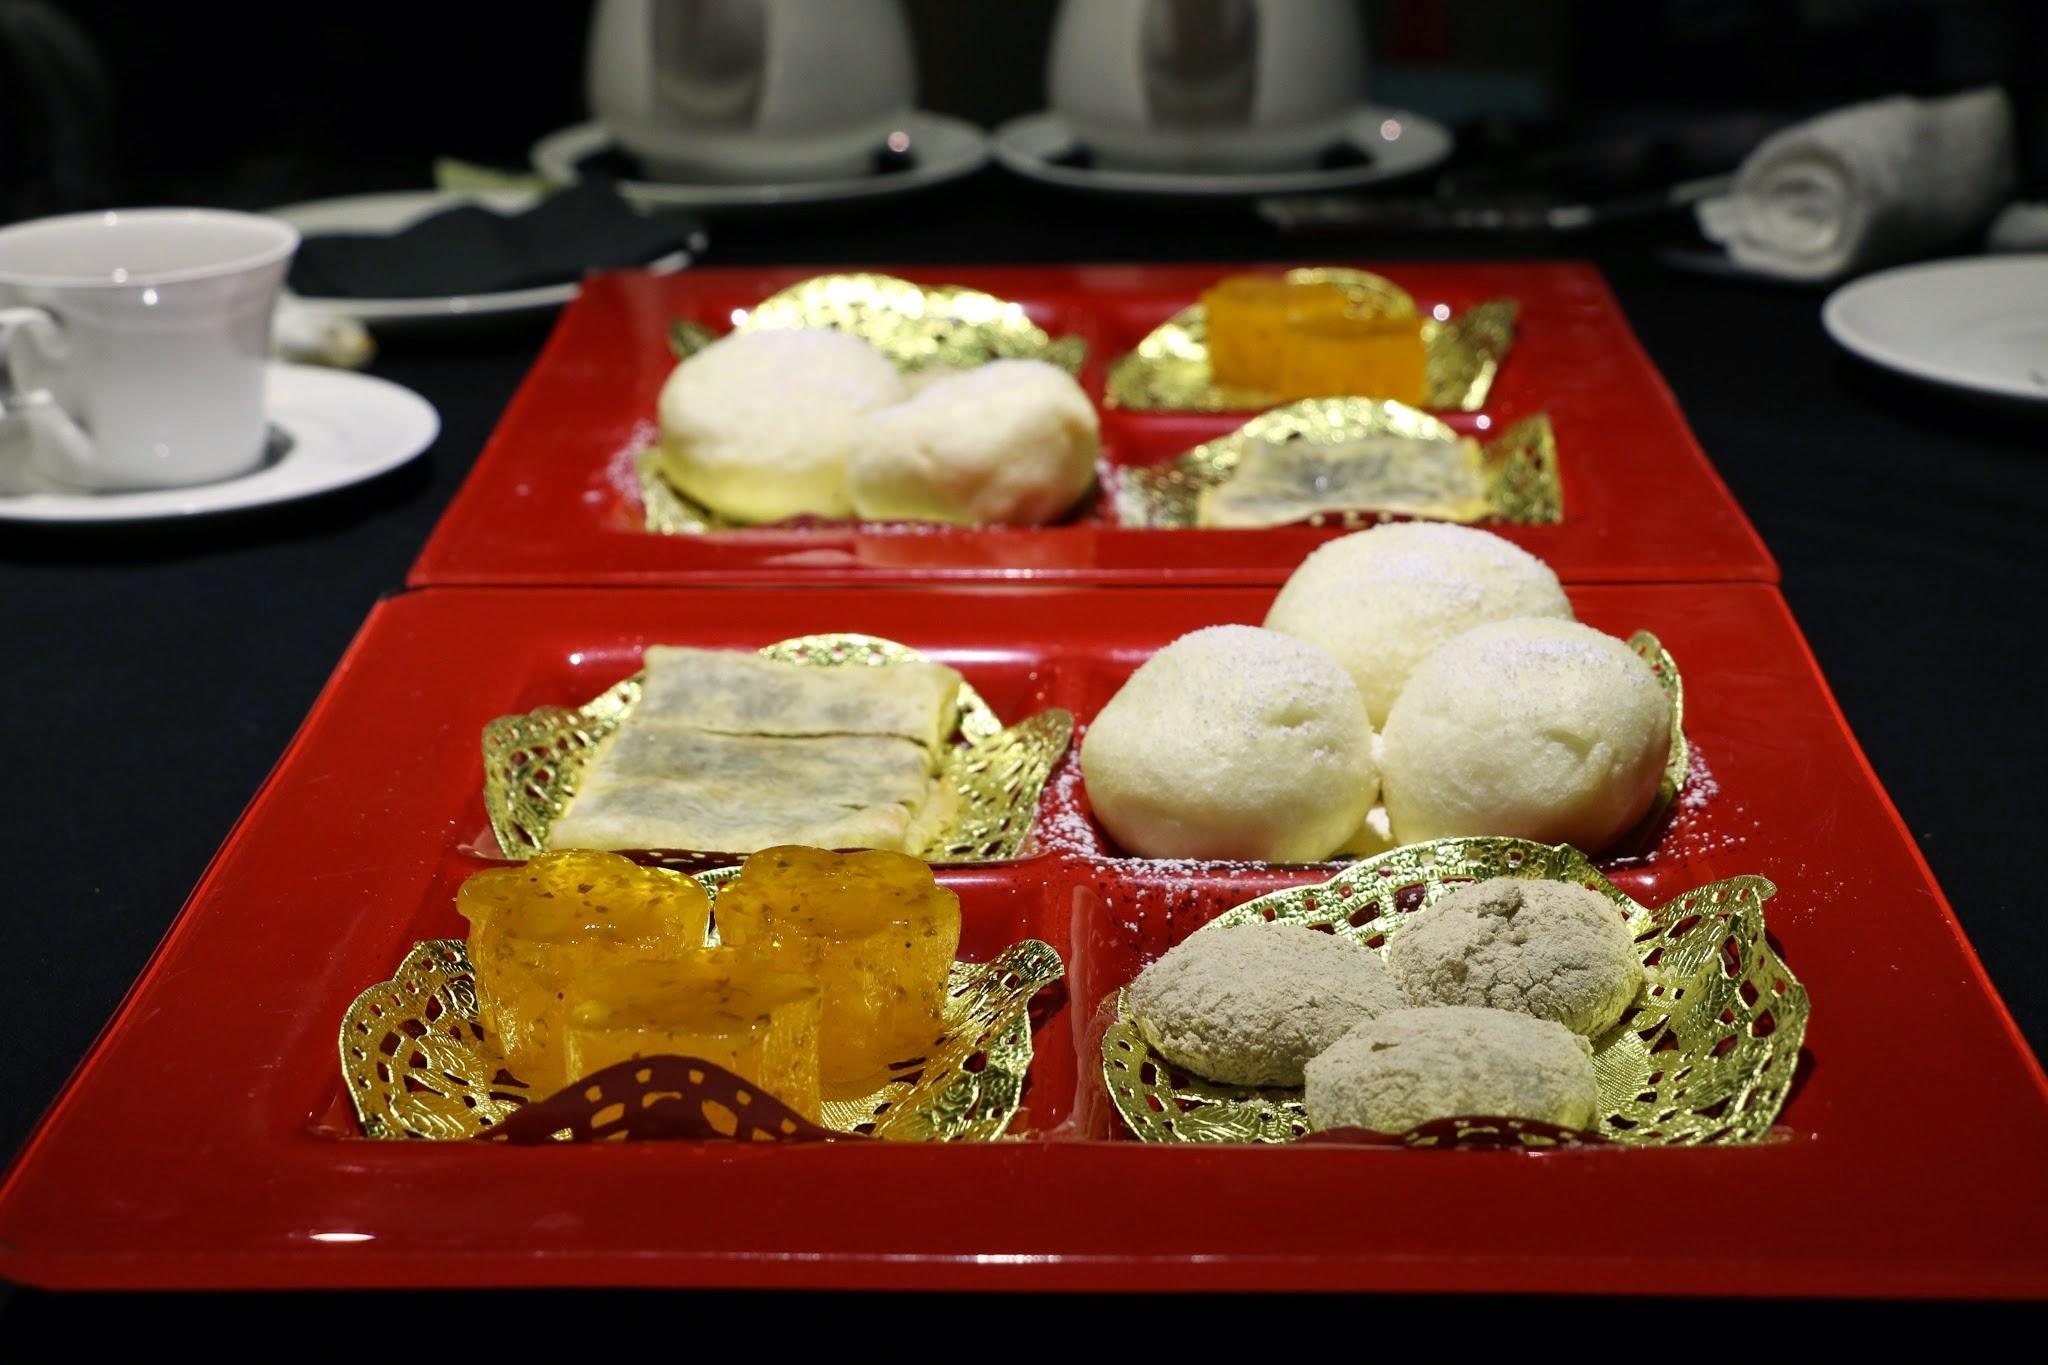 Shanghai Lo, Crab Kitchen, Dessert Platter, Sesame dumpling, osmanthus pudding, red bean pastry